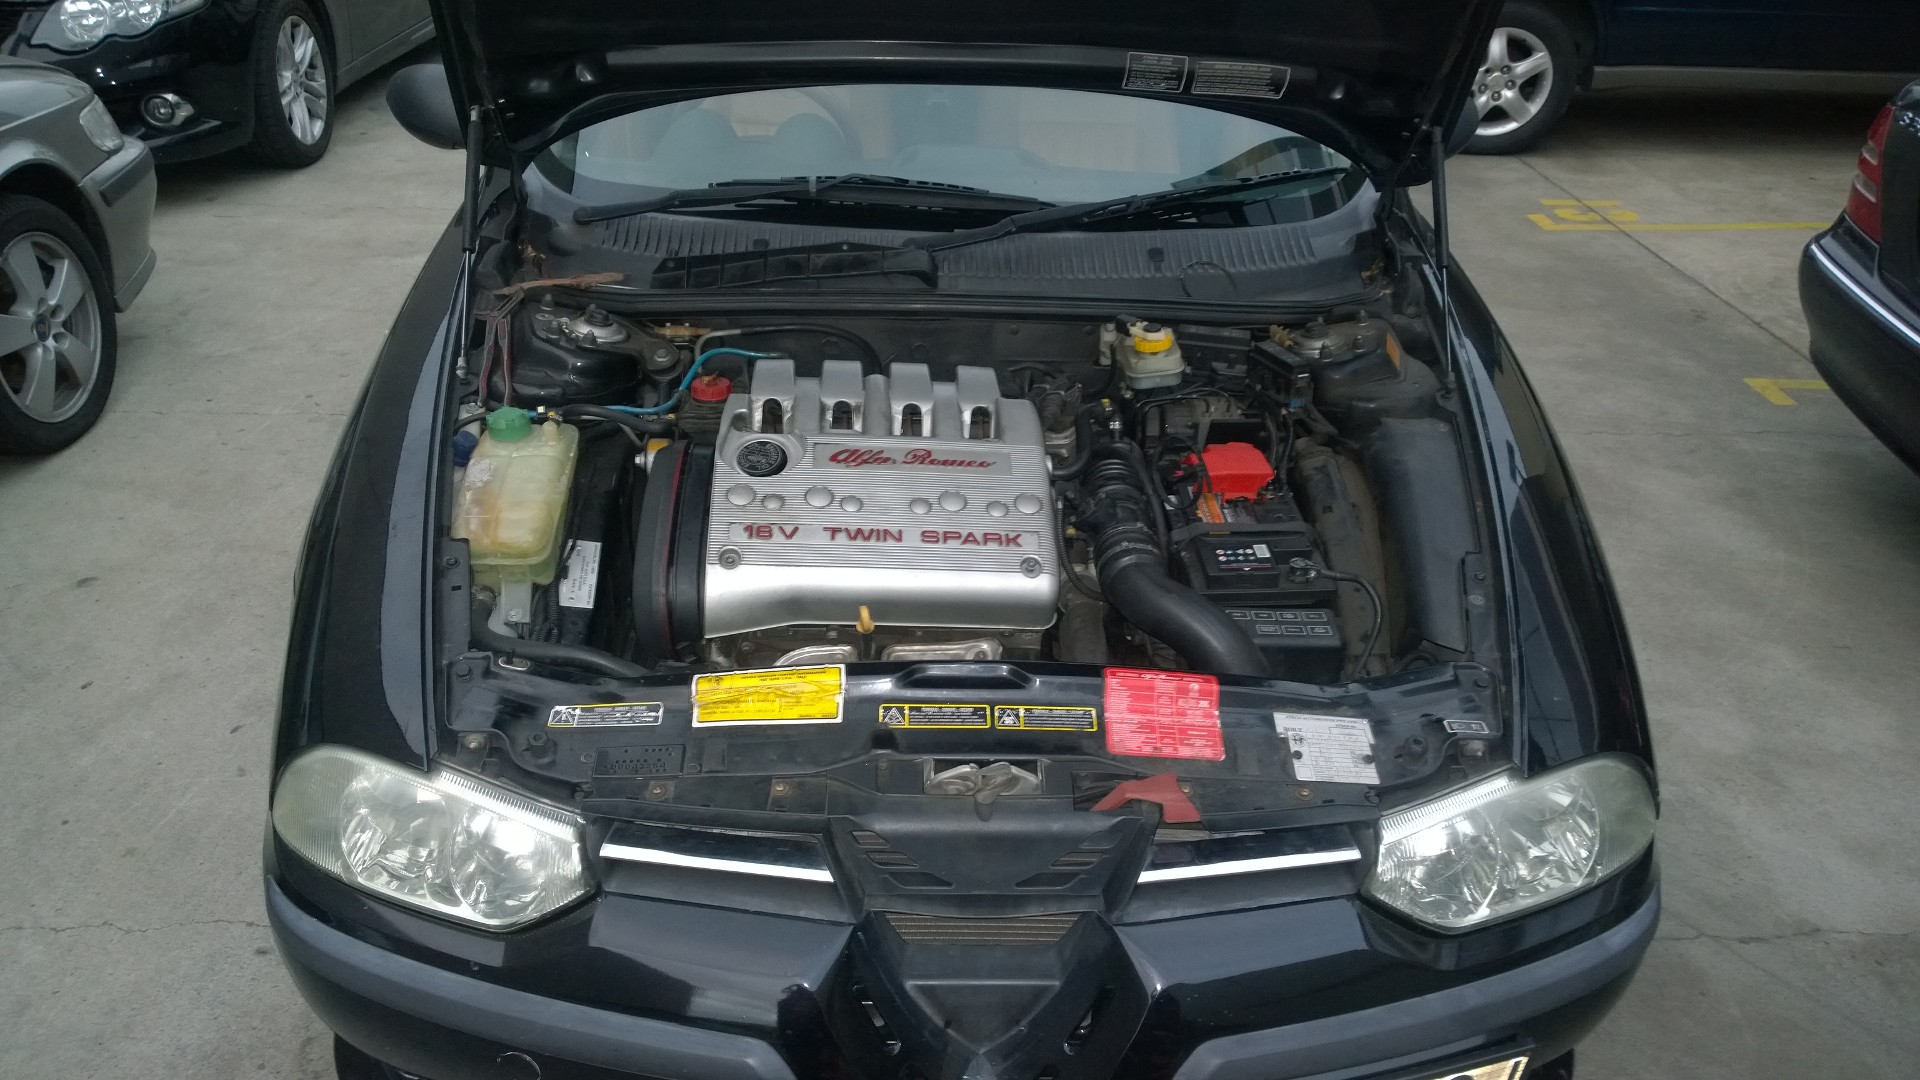 WP_20160219_06_42_38_Pro Nissan Wiring Diagram Key on